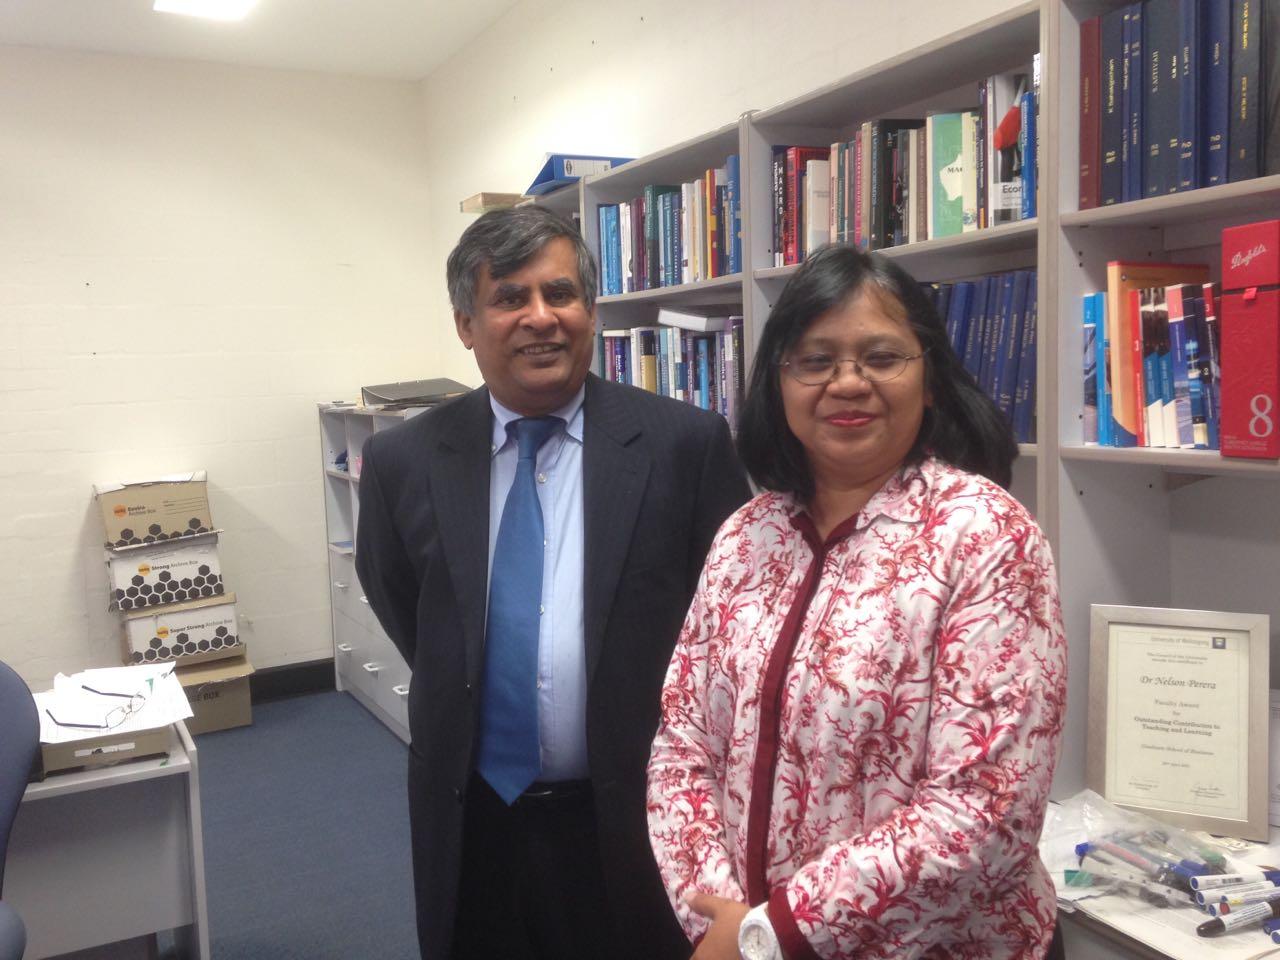 Andriani Kusumawati Bersama Dekan School Of Accounting, Economics & Finance University Of Wollongong